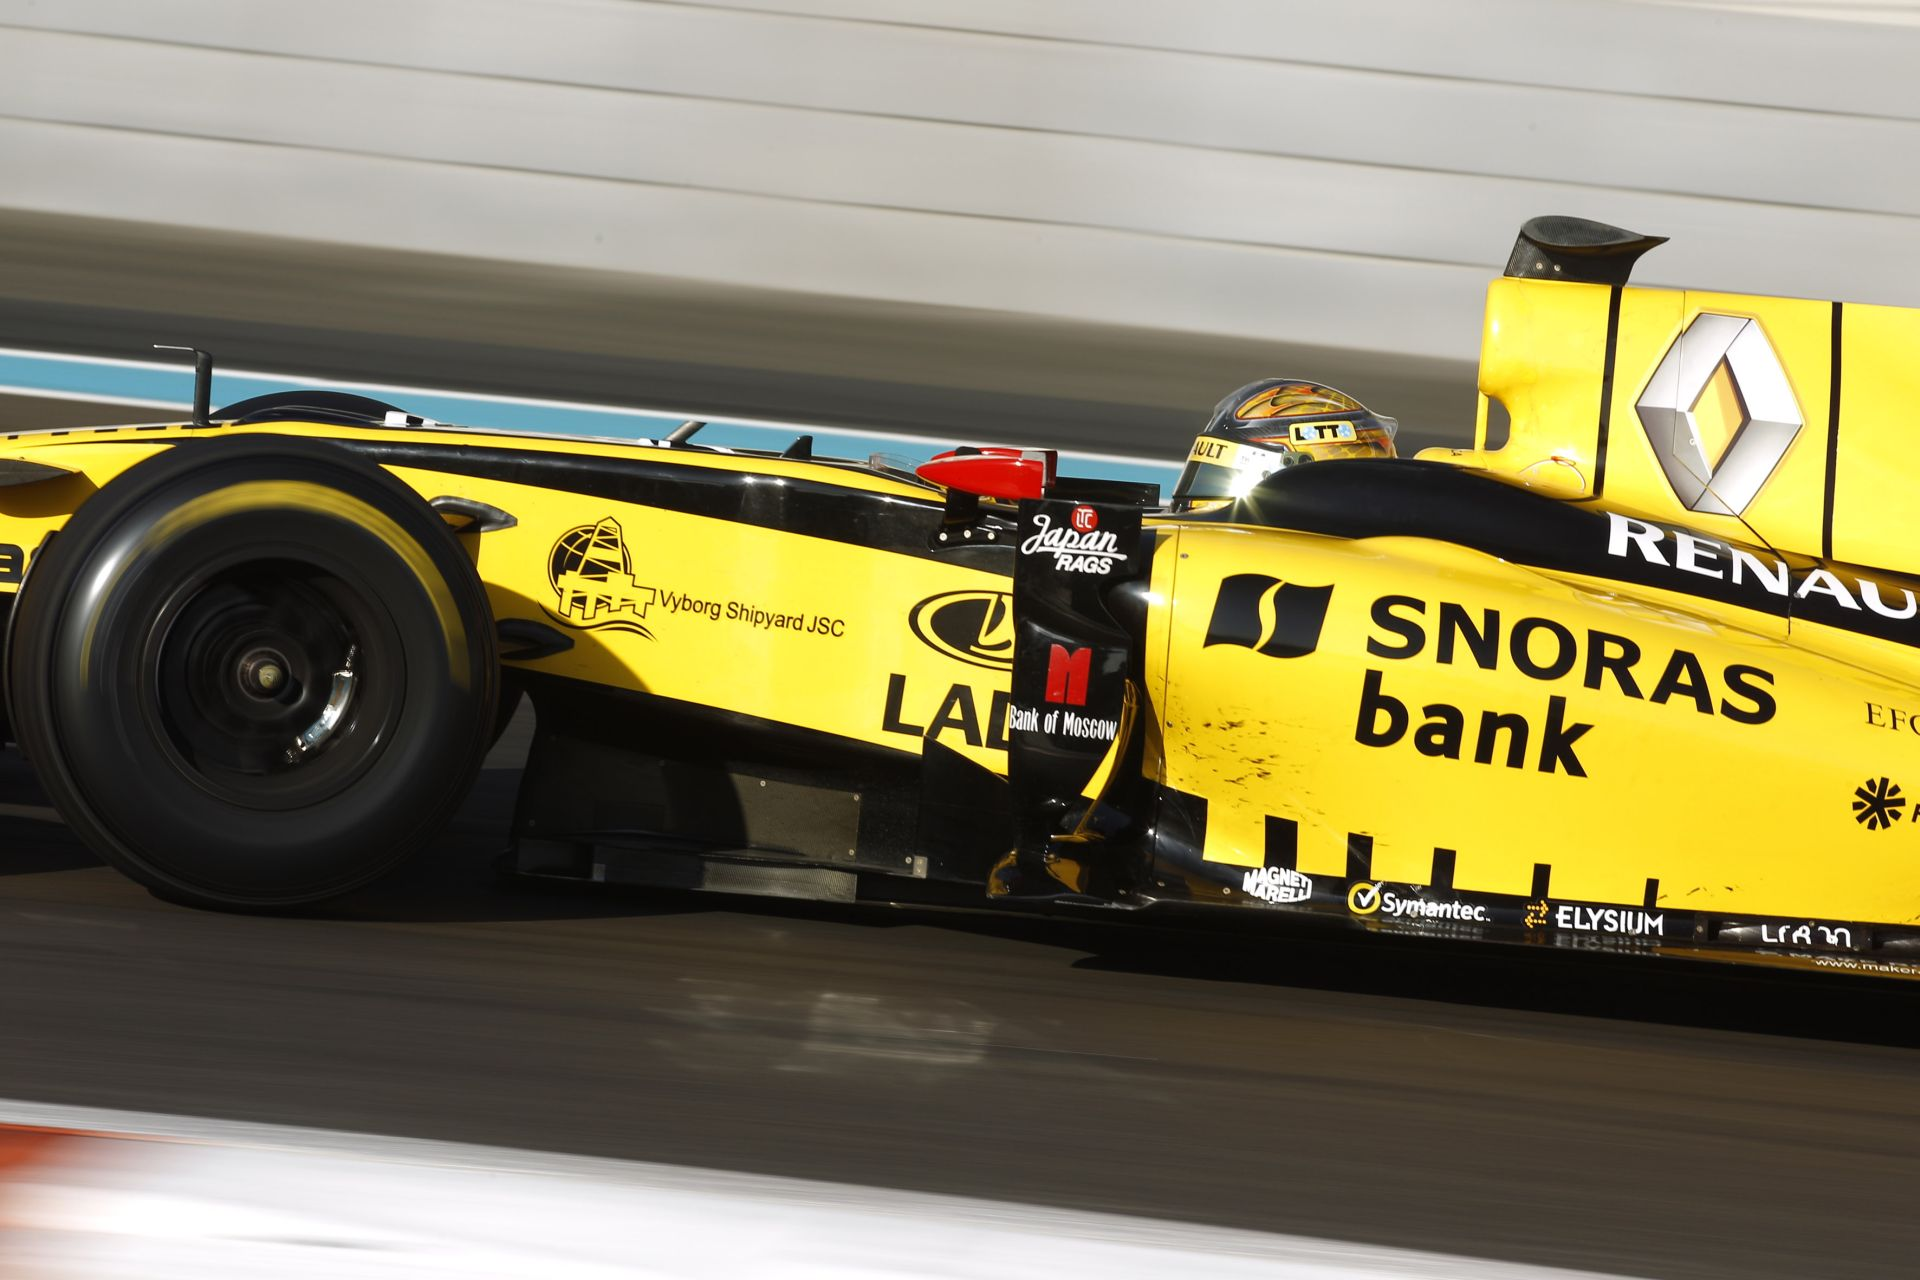 Jövőre még nem lesz Renault F1 Team?